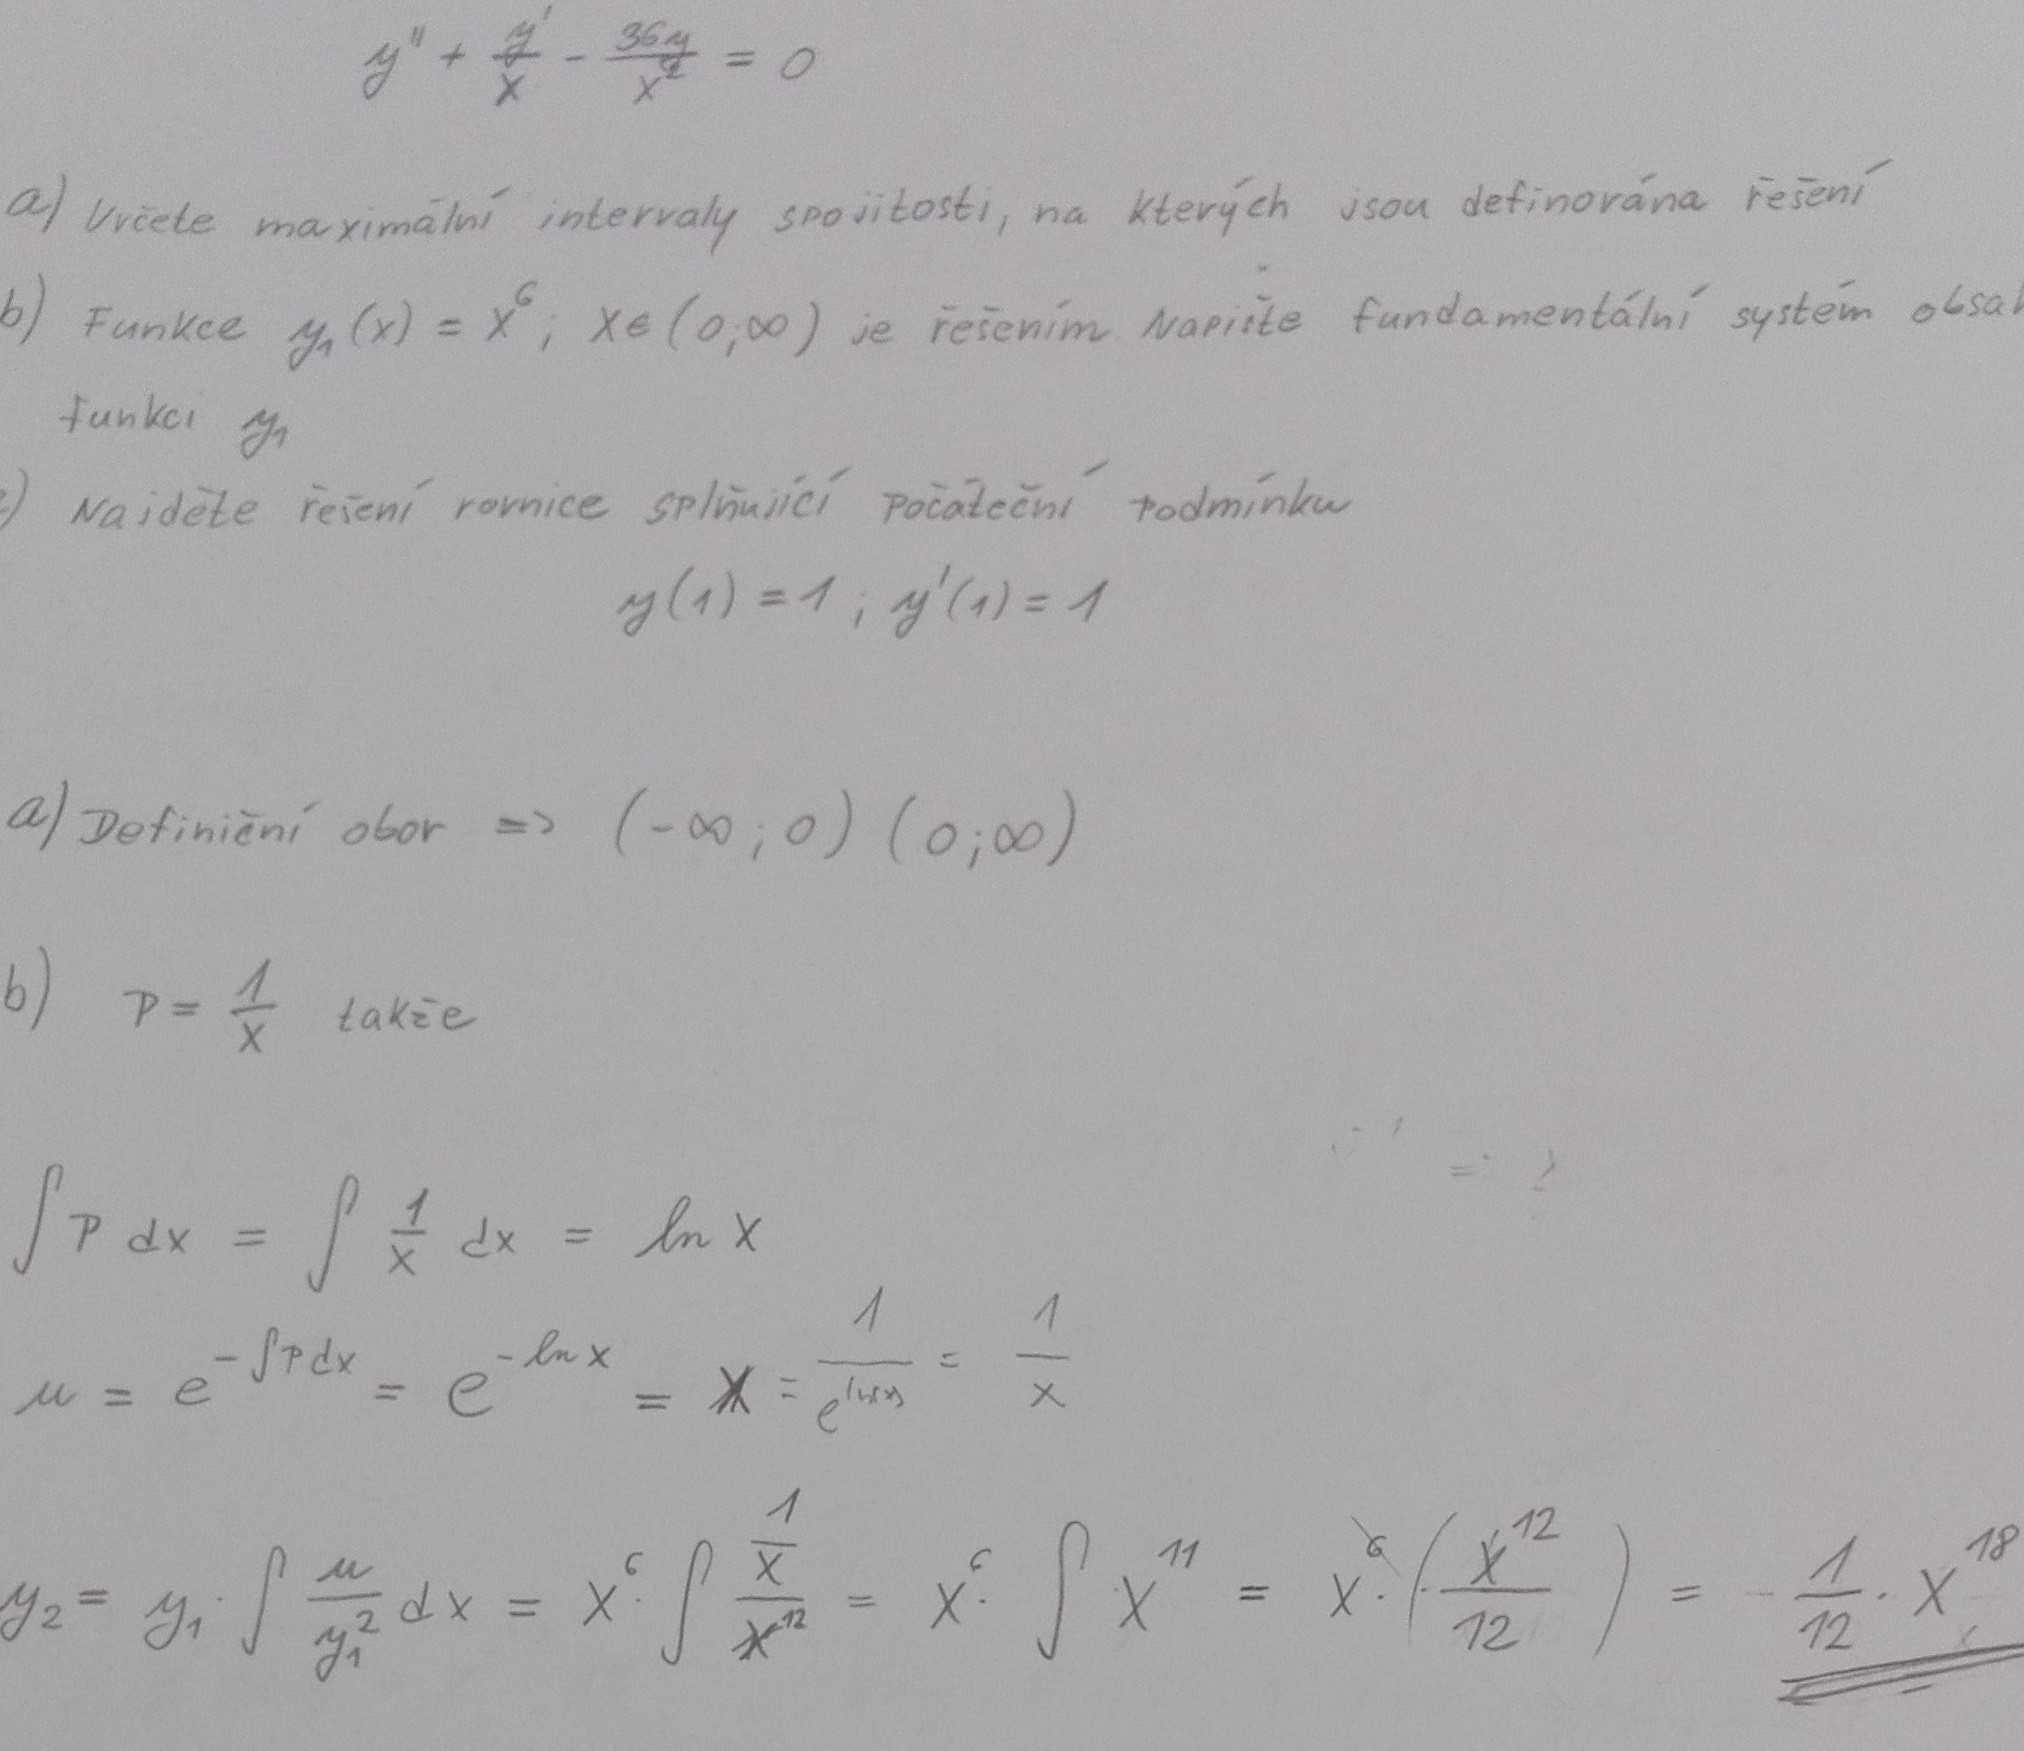 http://forum.matematika.cz/upload3/img/2018-01/95715_IMG_20180110_153949.jpg